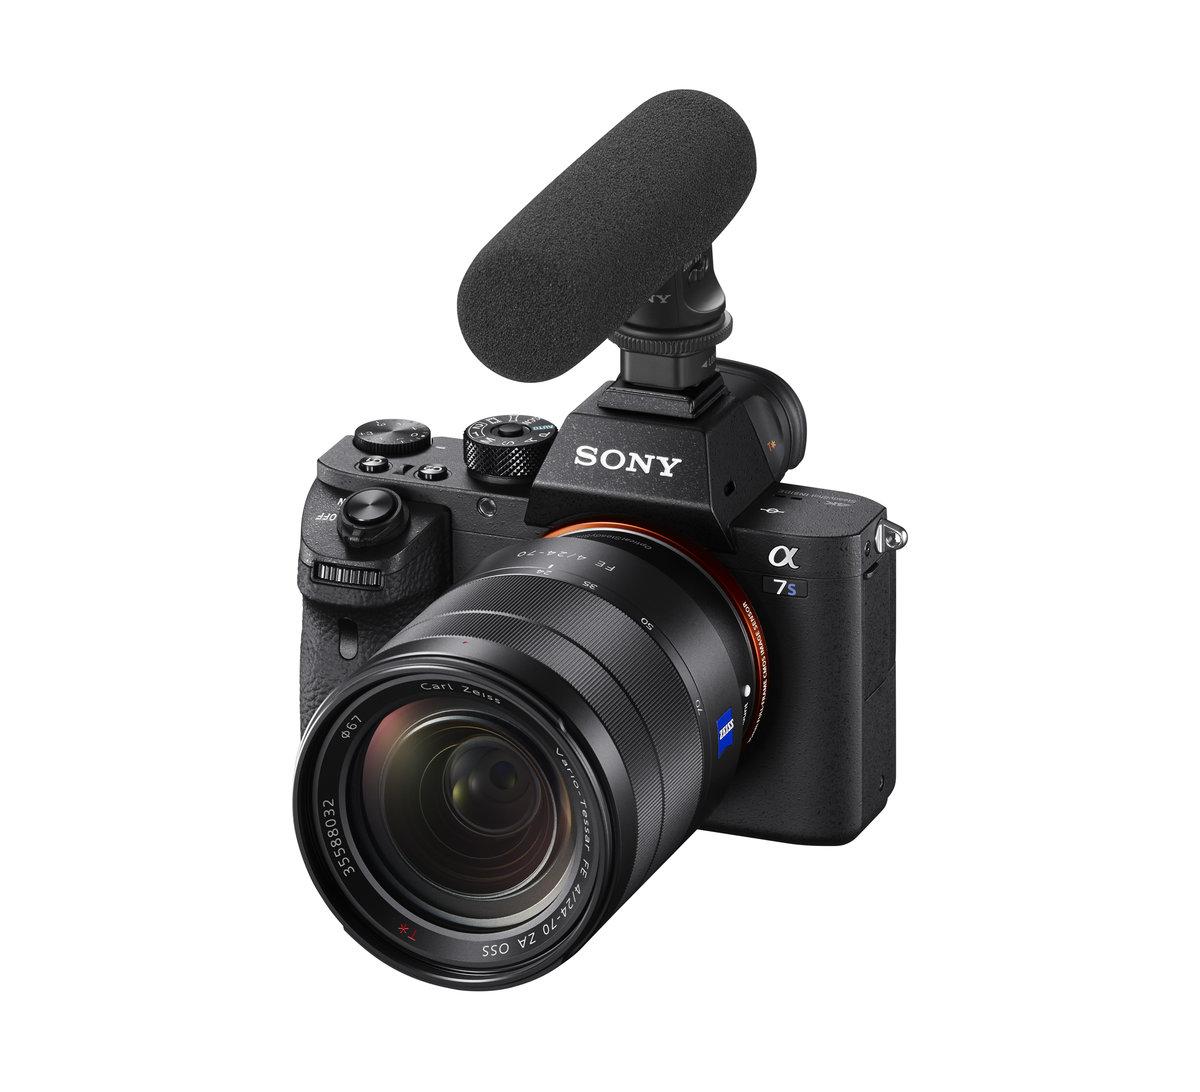 Sony Ecm Gz1m Microphone Zoom For Cyber Shot Dsc Rx10 Hdr Pj810 Full Hd Handycam Camcorder Fdr Ax40 Ax53 Ax55 Cx625 Pj675 6300 6500 99 Ii Dell United States